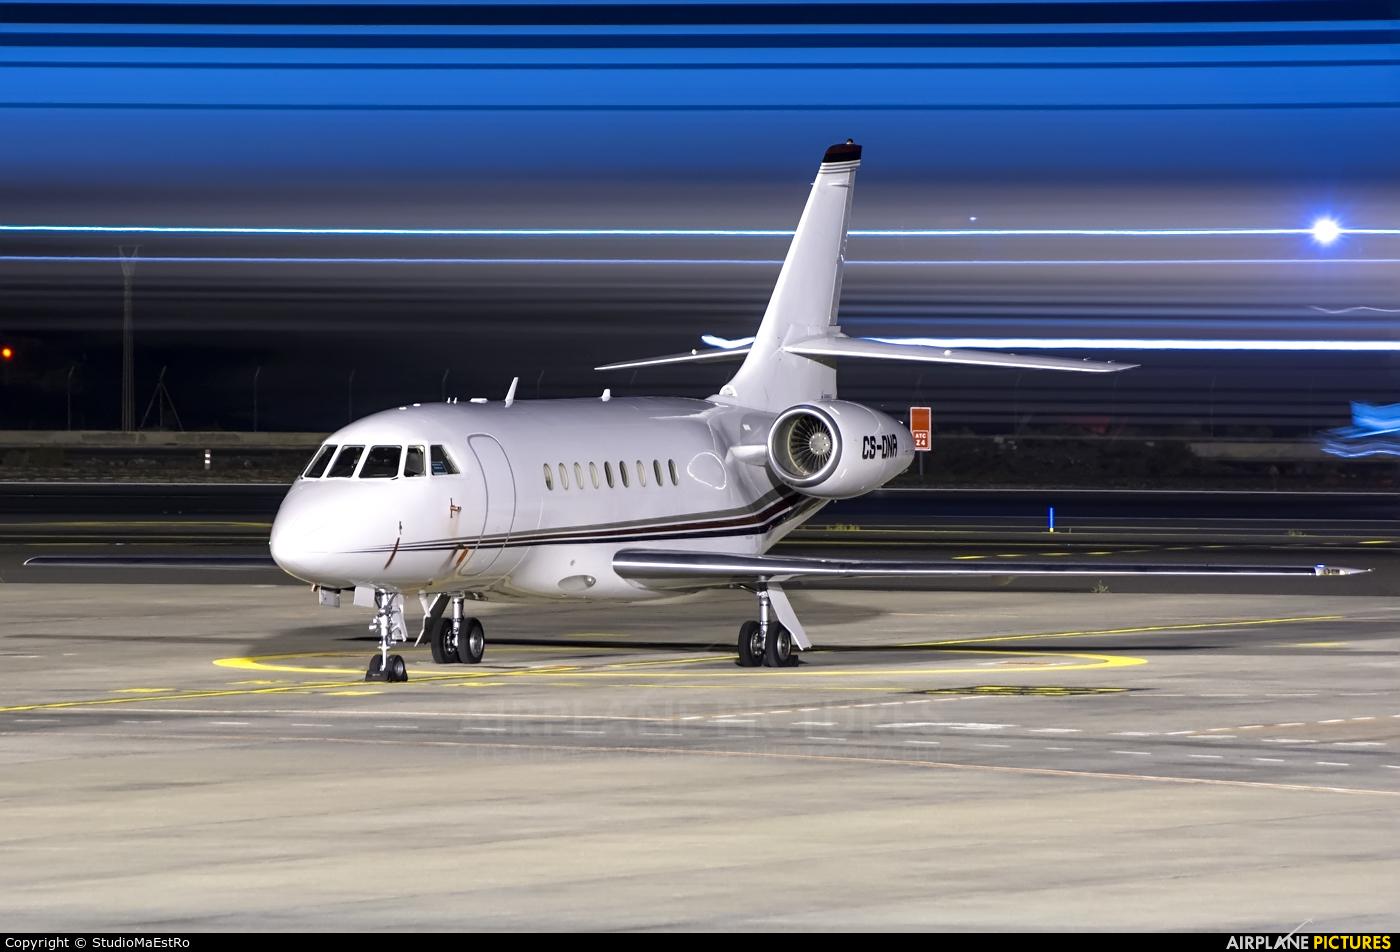 NetJets Europe (Portugal) CS-DNR aircraft at Tenerife Sur - Reina Sofia